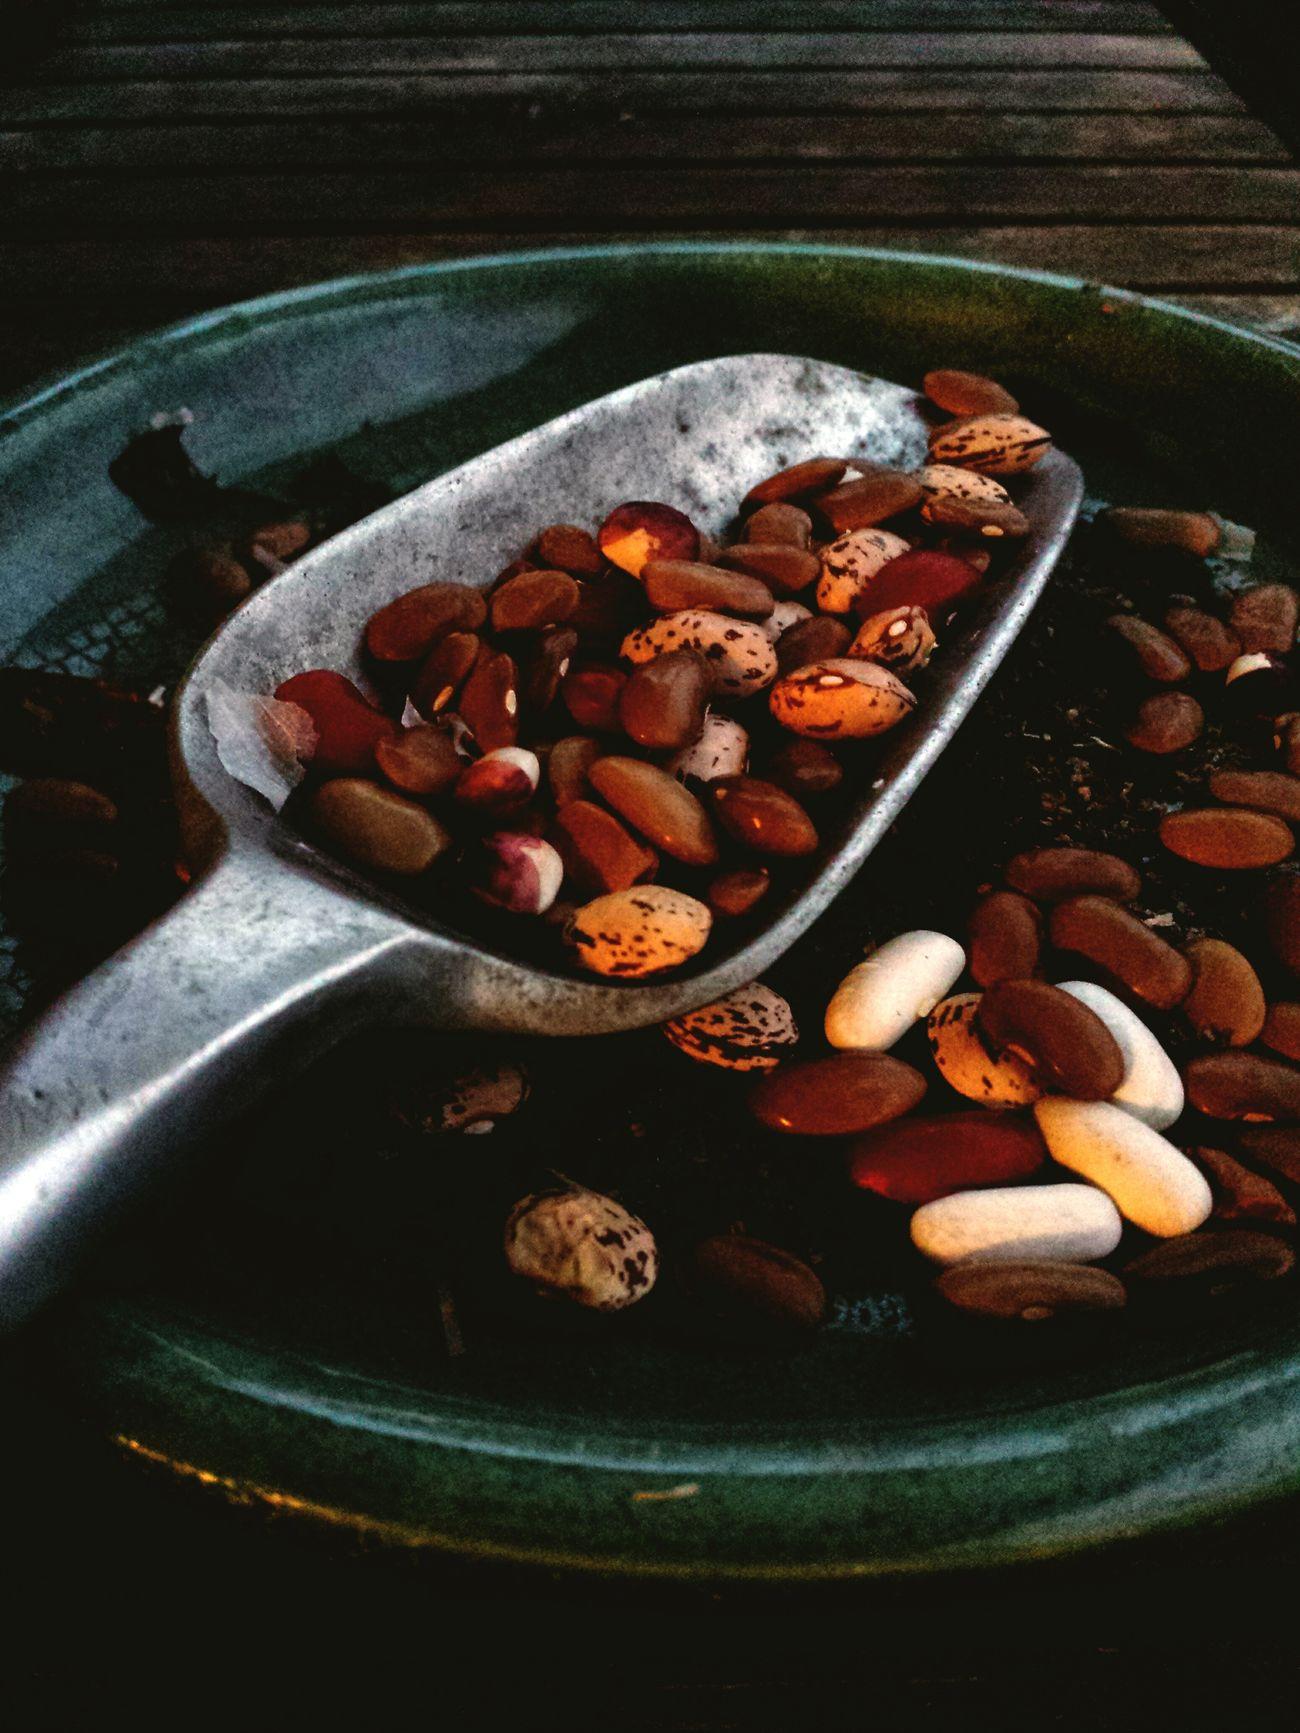 Dusk gardening in spring Spring Beans Planting Seeds